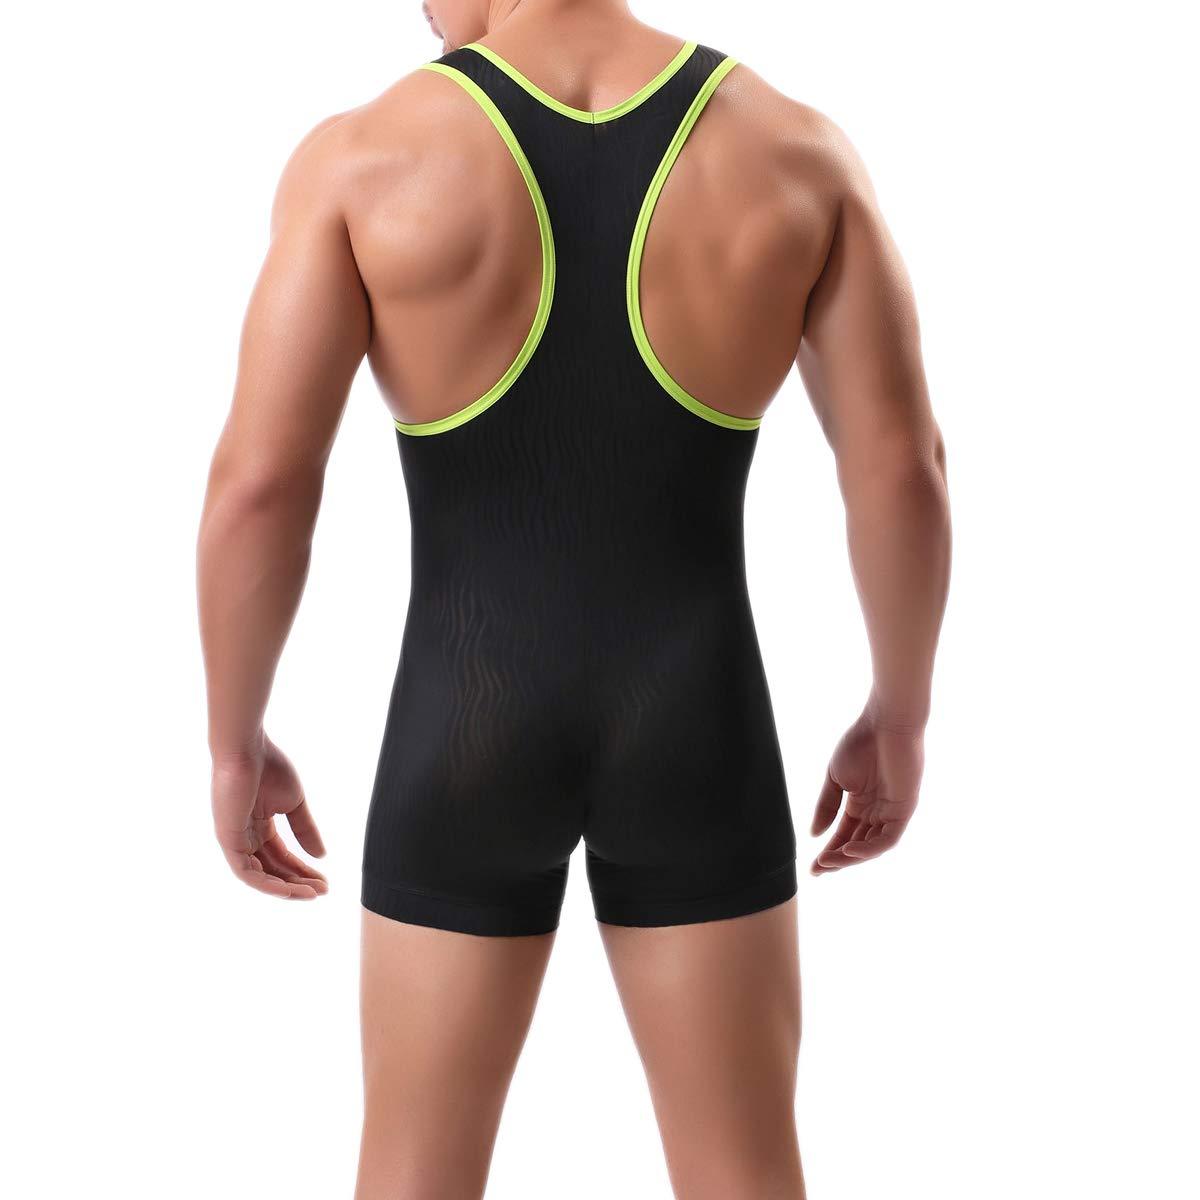 Mens Suspenders Wrestling Singlet Leotard Thong Bodysuit Jumpsuit Briefs Swimwear